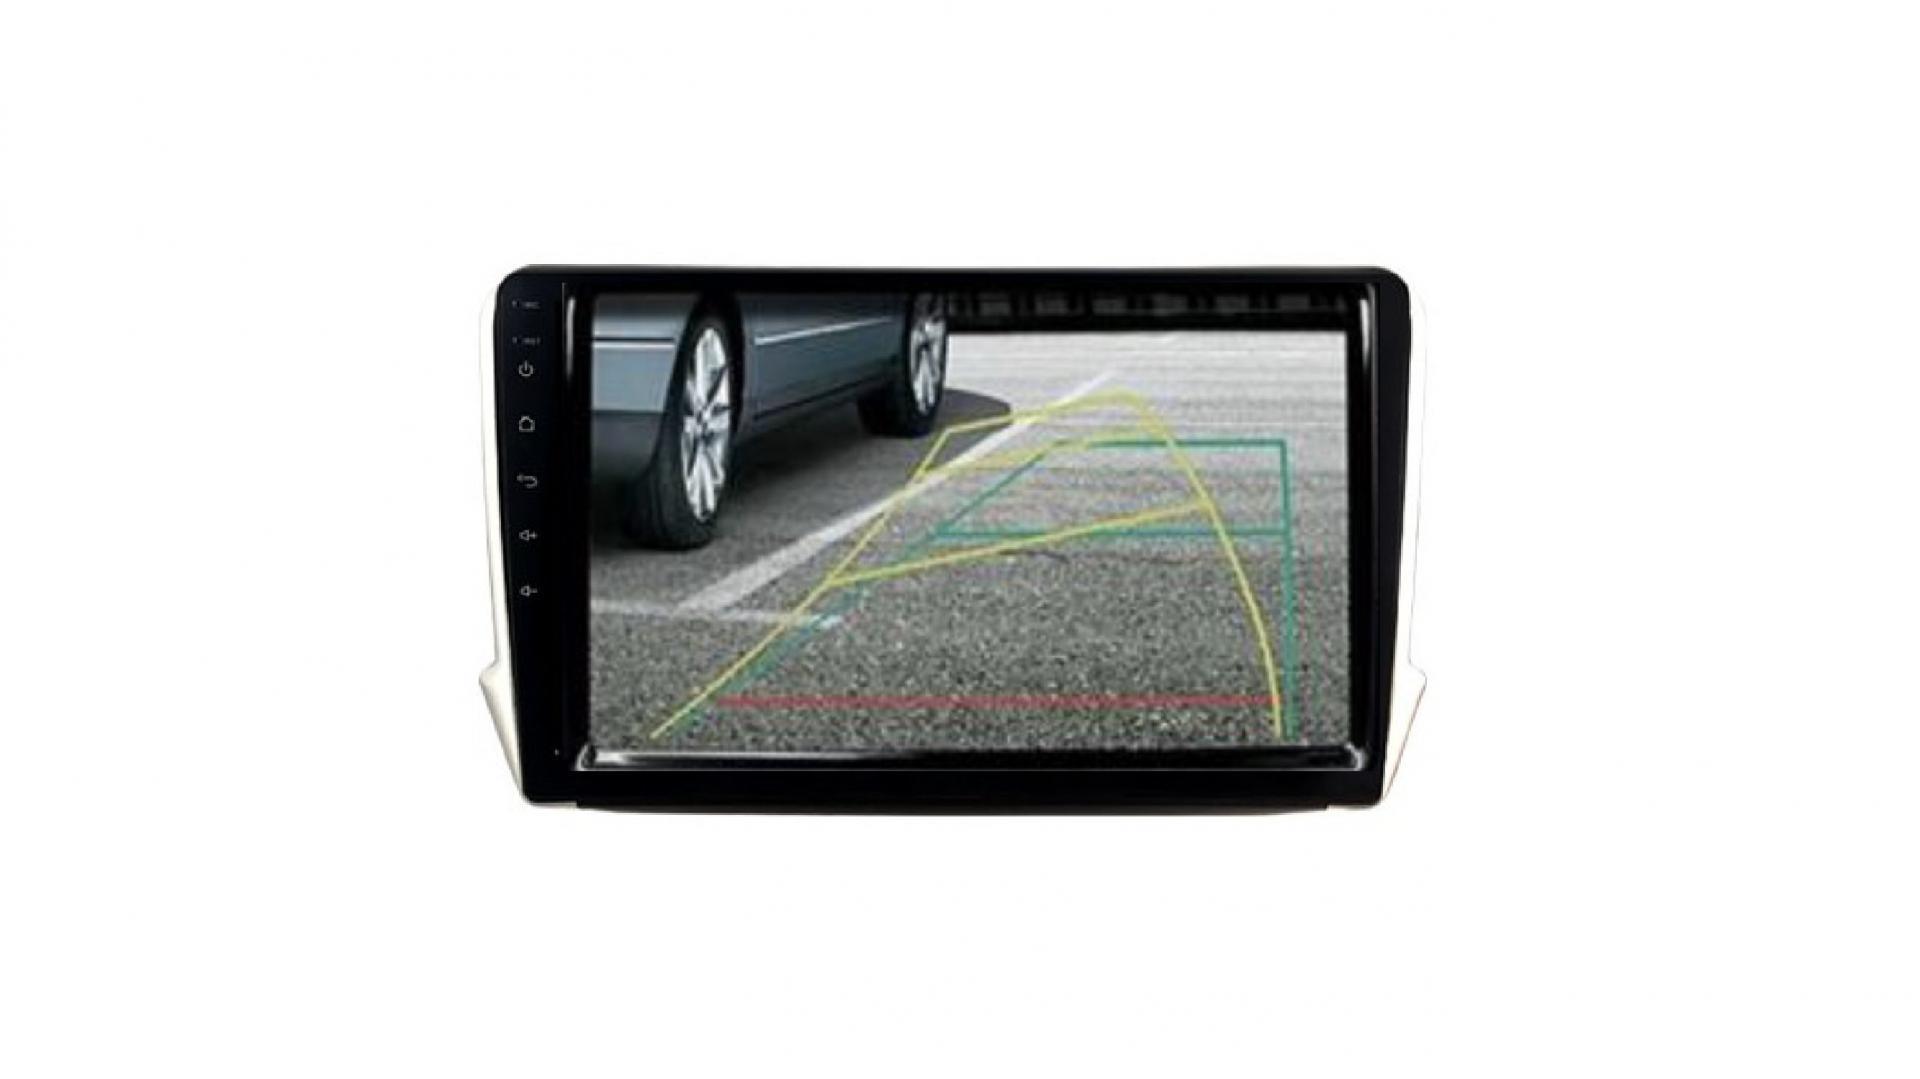 208 2008 autoradio gps bluetooth android auto carplay camera de recul commande au volant1